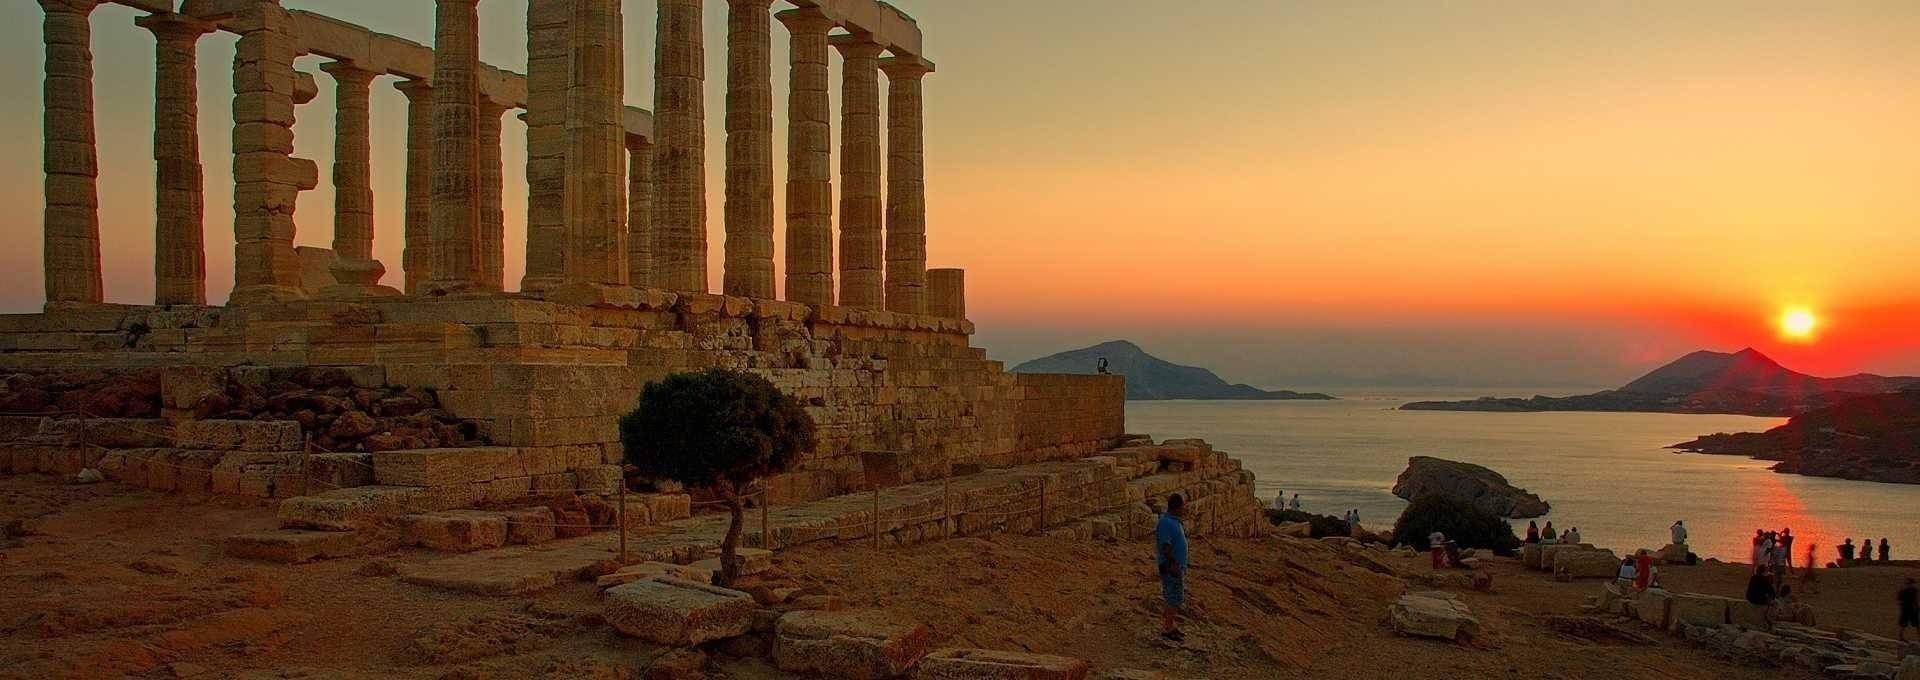 The Original Sunset Tour: Cape Sounion & Temple of Poseidon